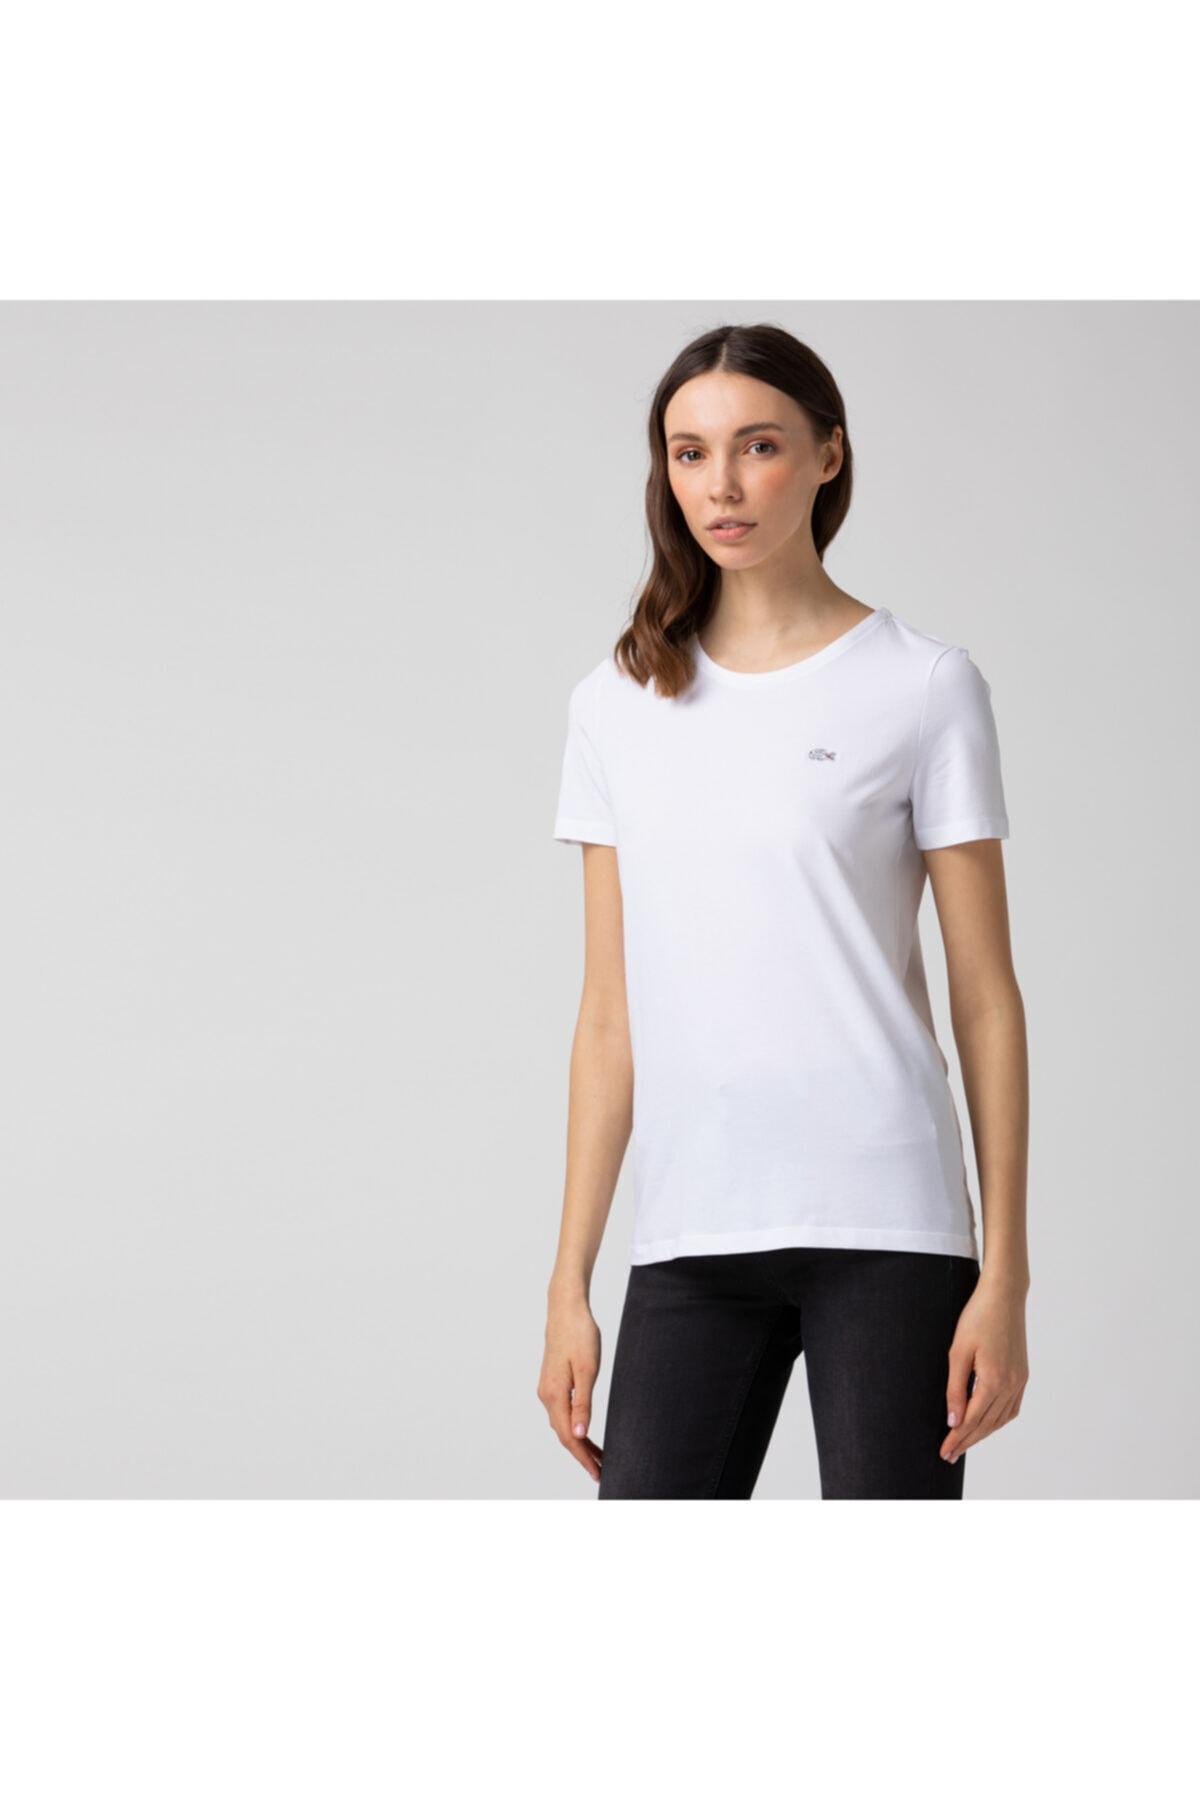 Kadın Slim Fit Bisiklet Yaka Beyaz T-shirt